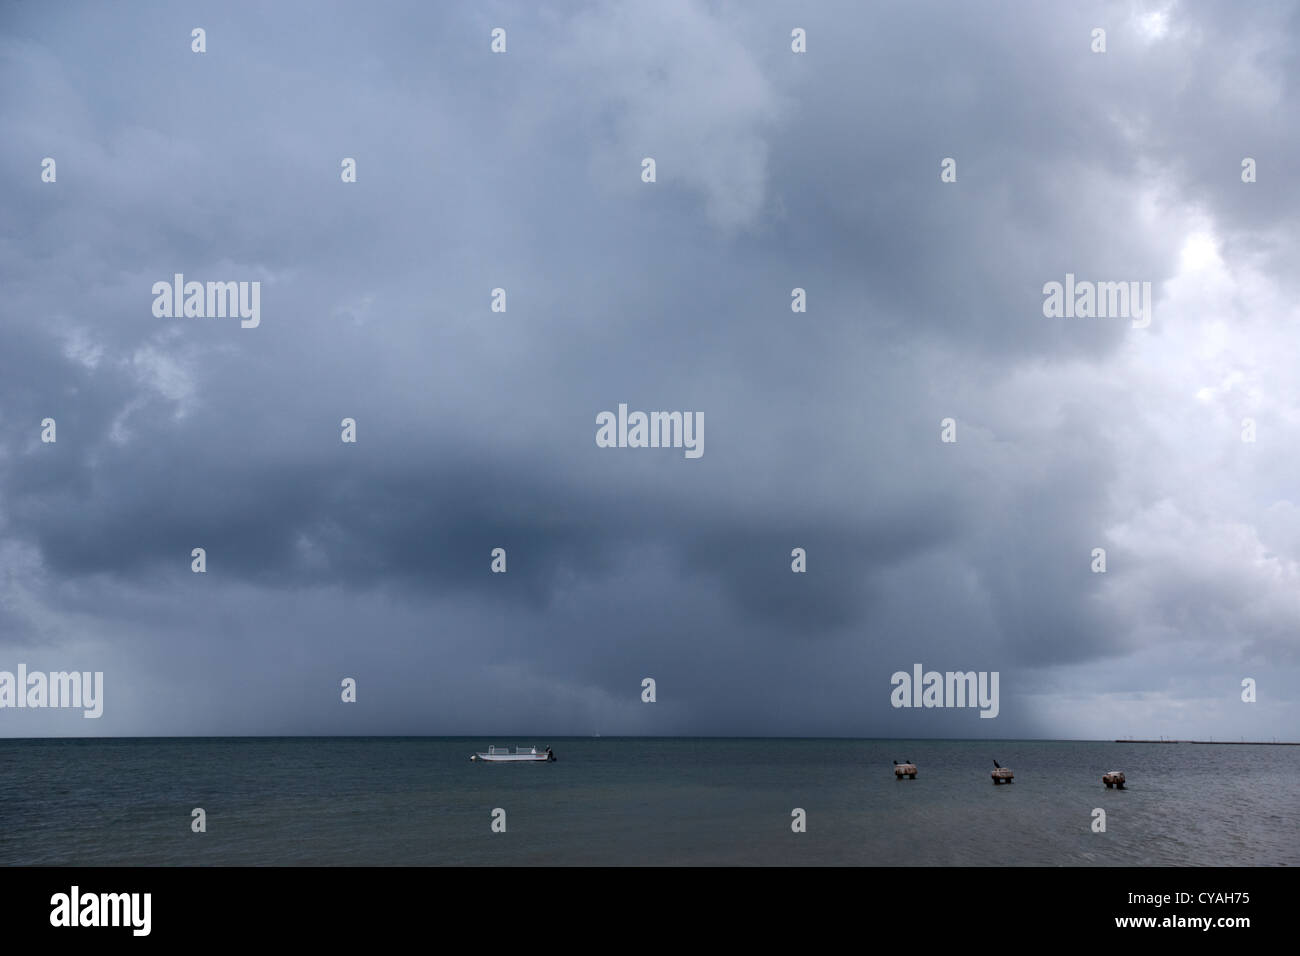 rainstorm thunderstorm storm clouds approaching key west florida usa - Stock Image